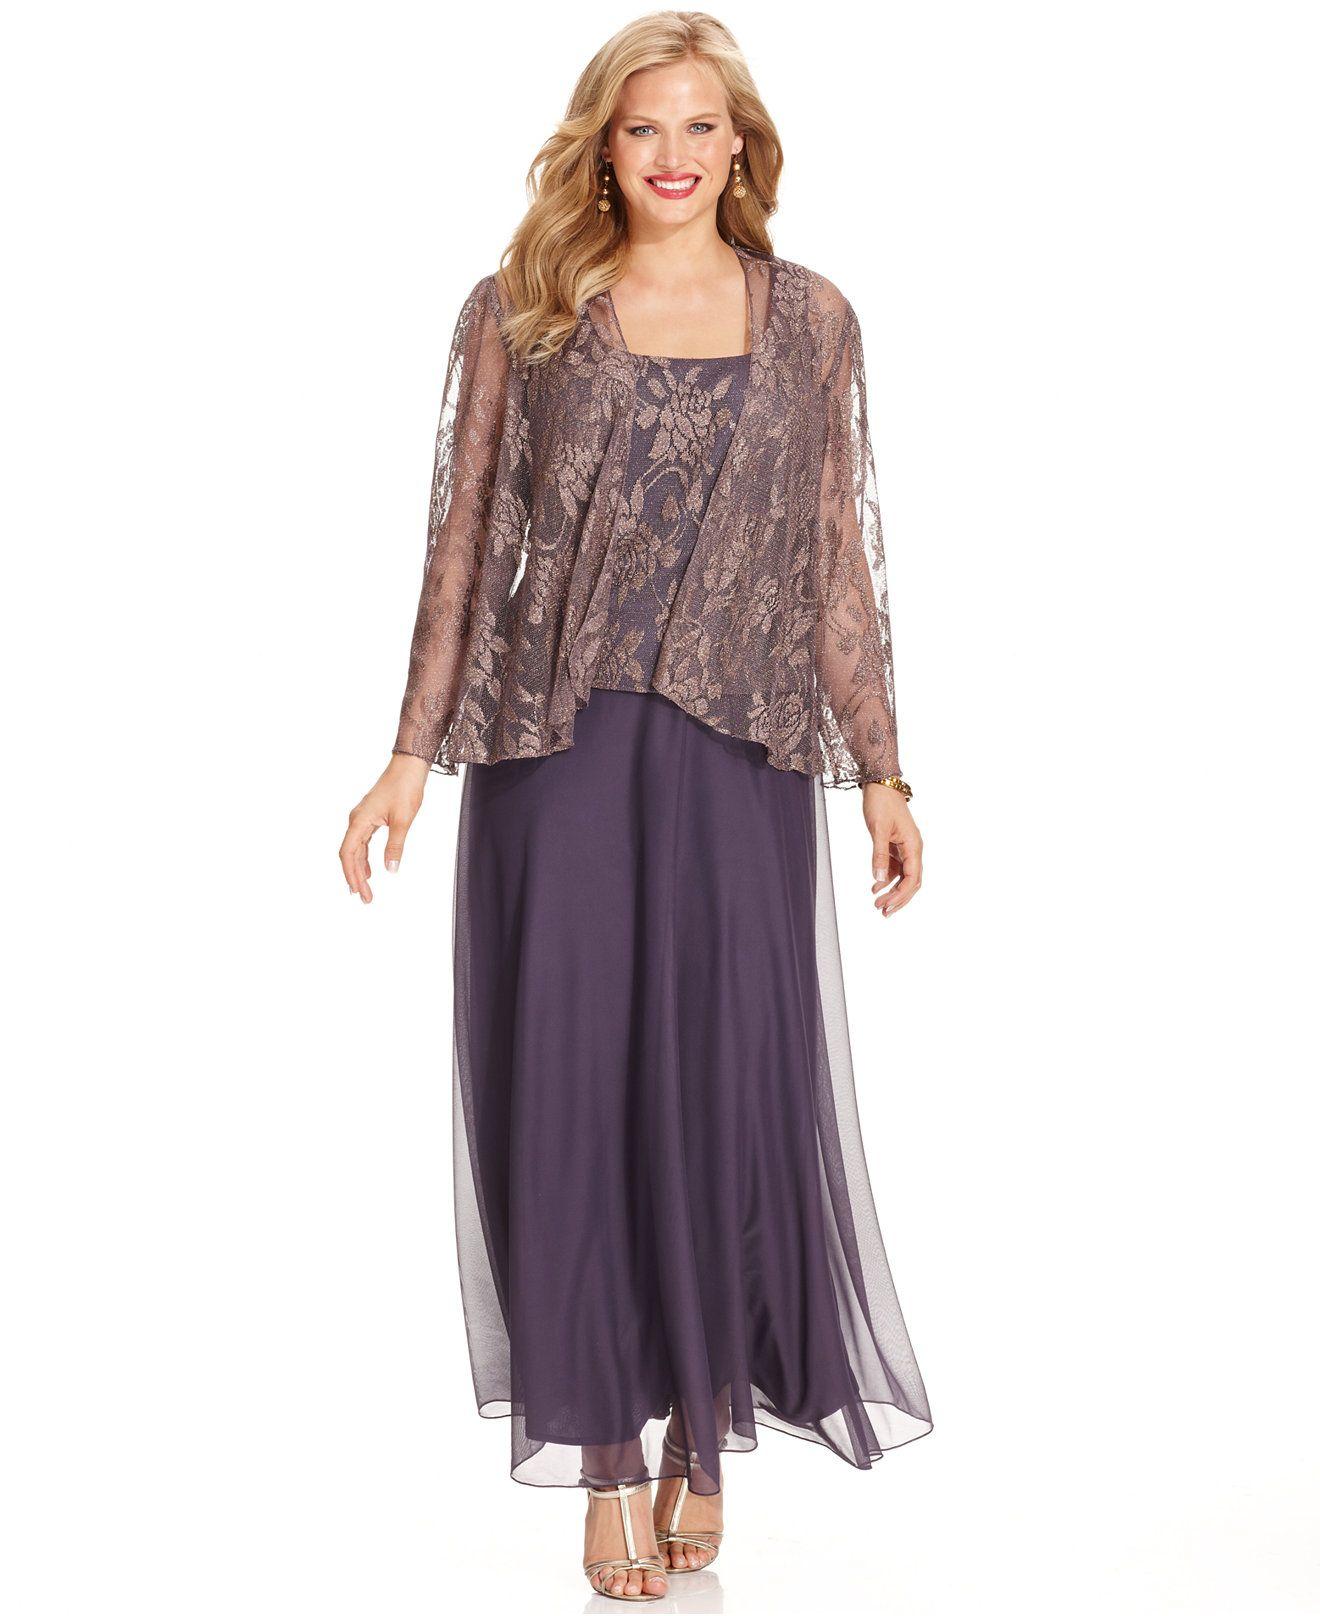 Lace dress macys  Patra Plus Metallic Lace Dress and Jacket  Dresses  Plus Sizes